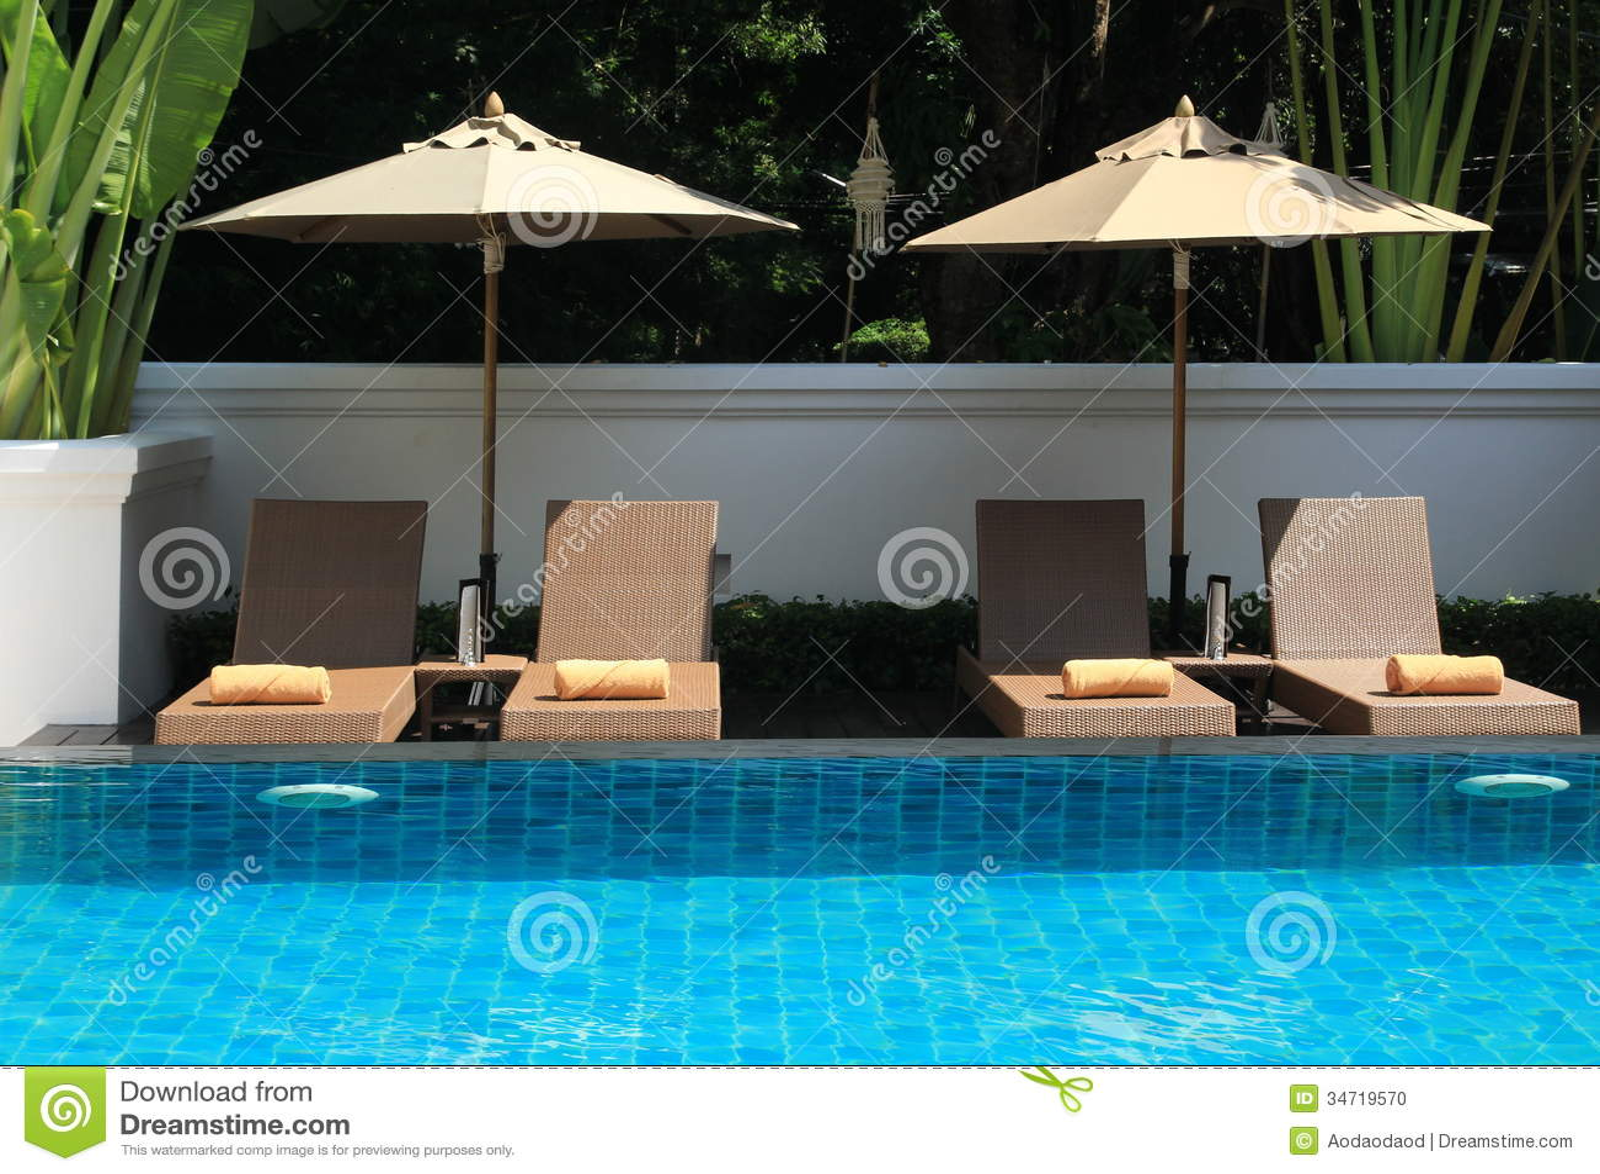 Swimming pool stock photo. Image of estate, real, brick - 34719570